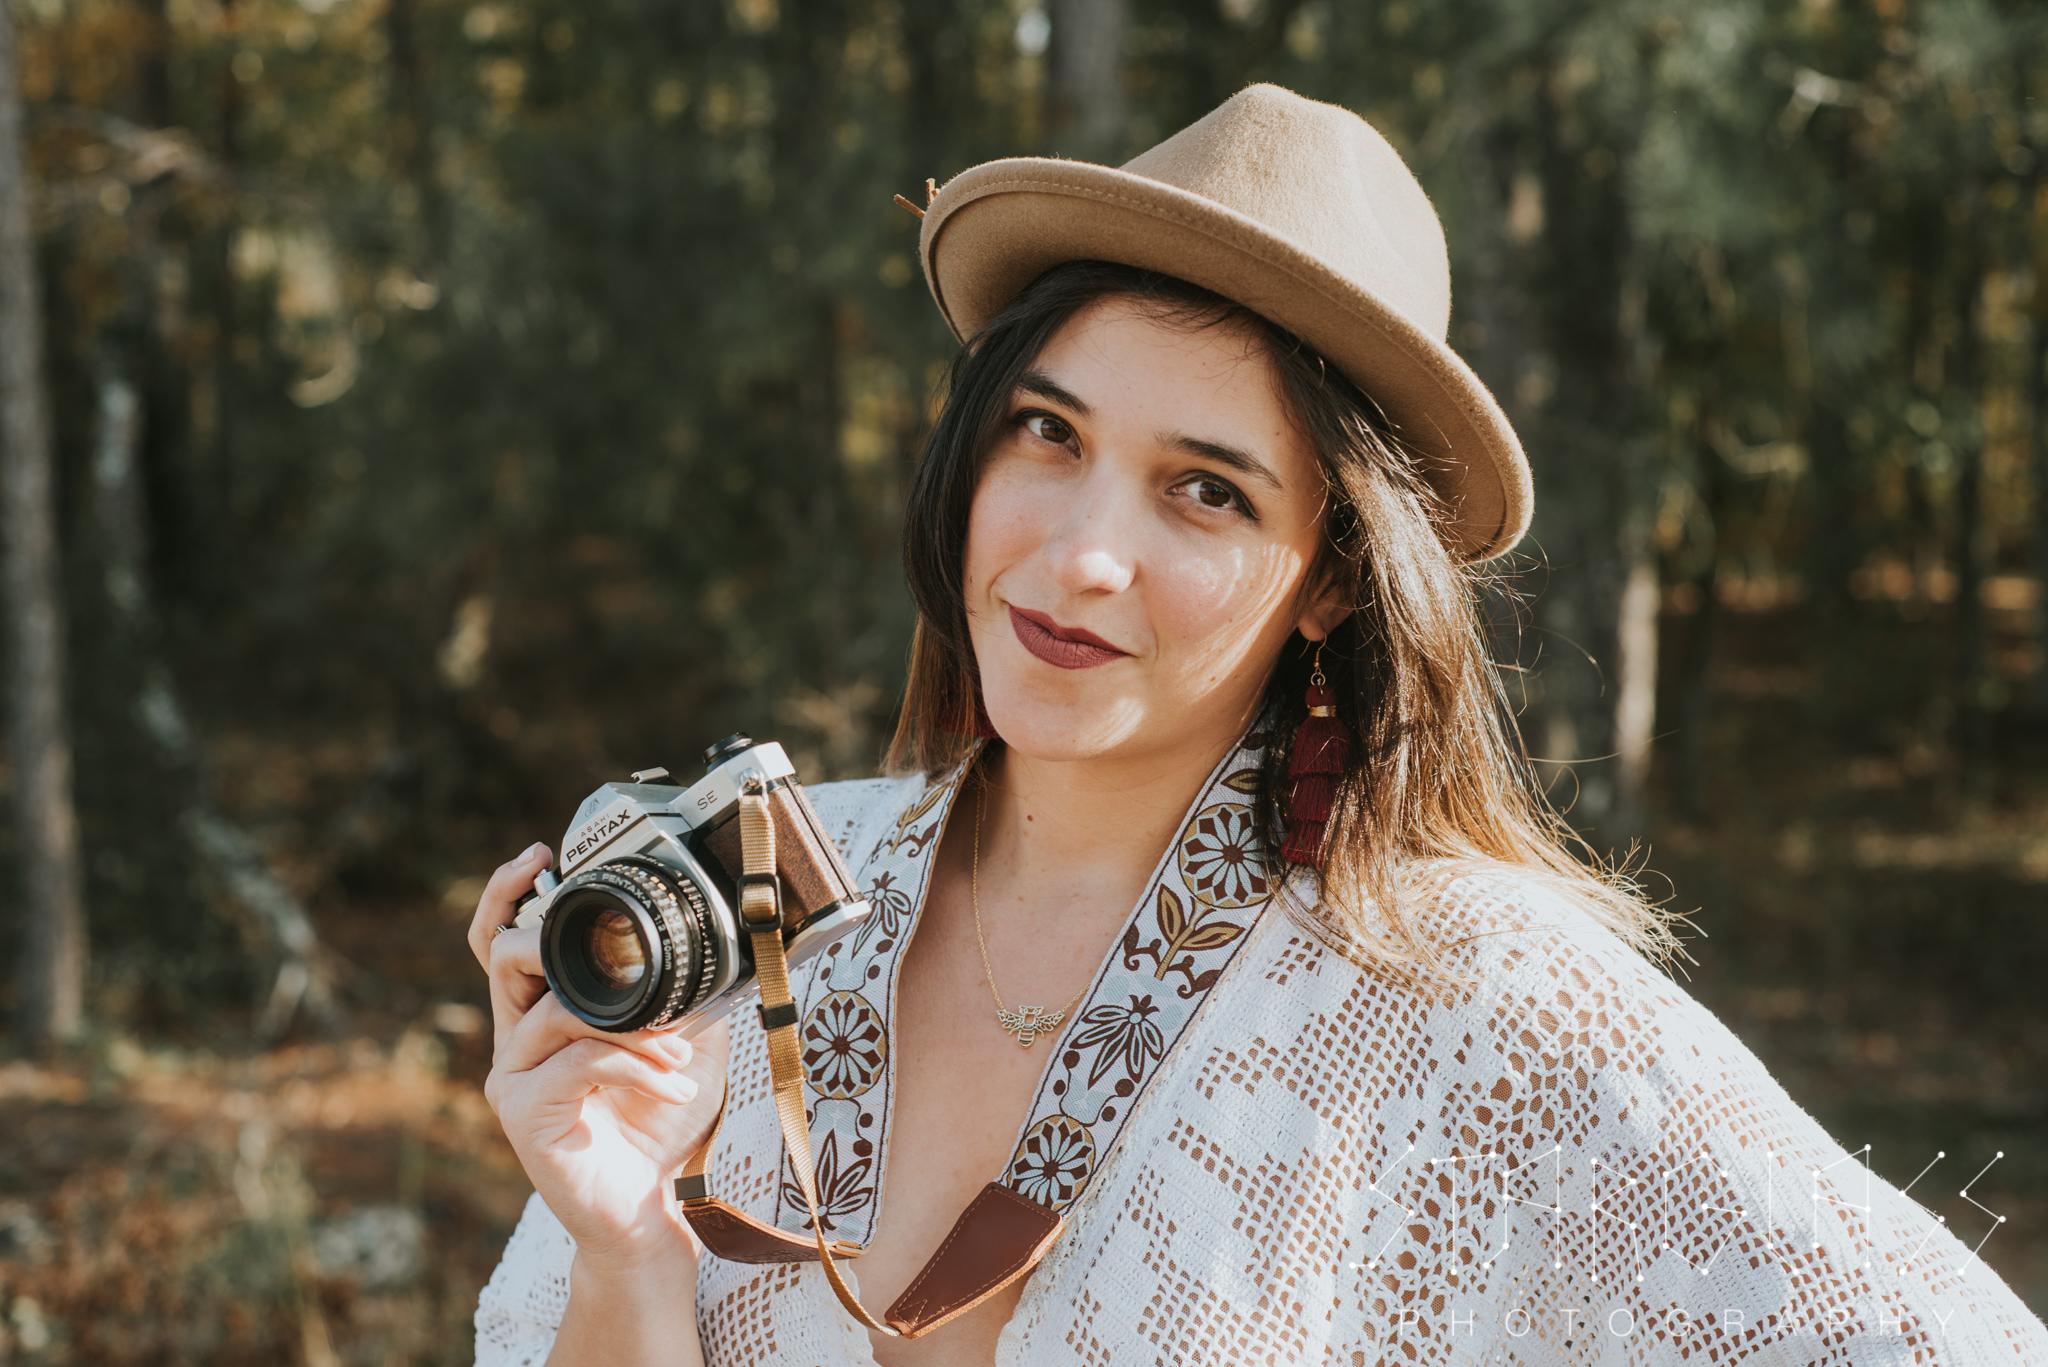 photographerheadshot